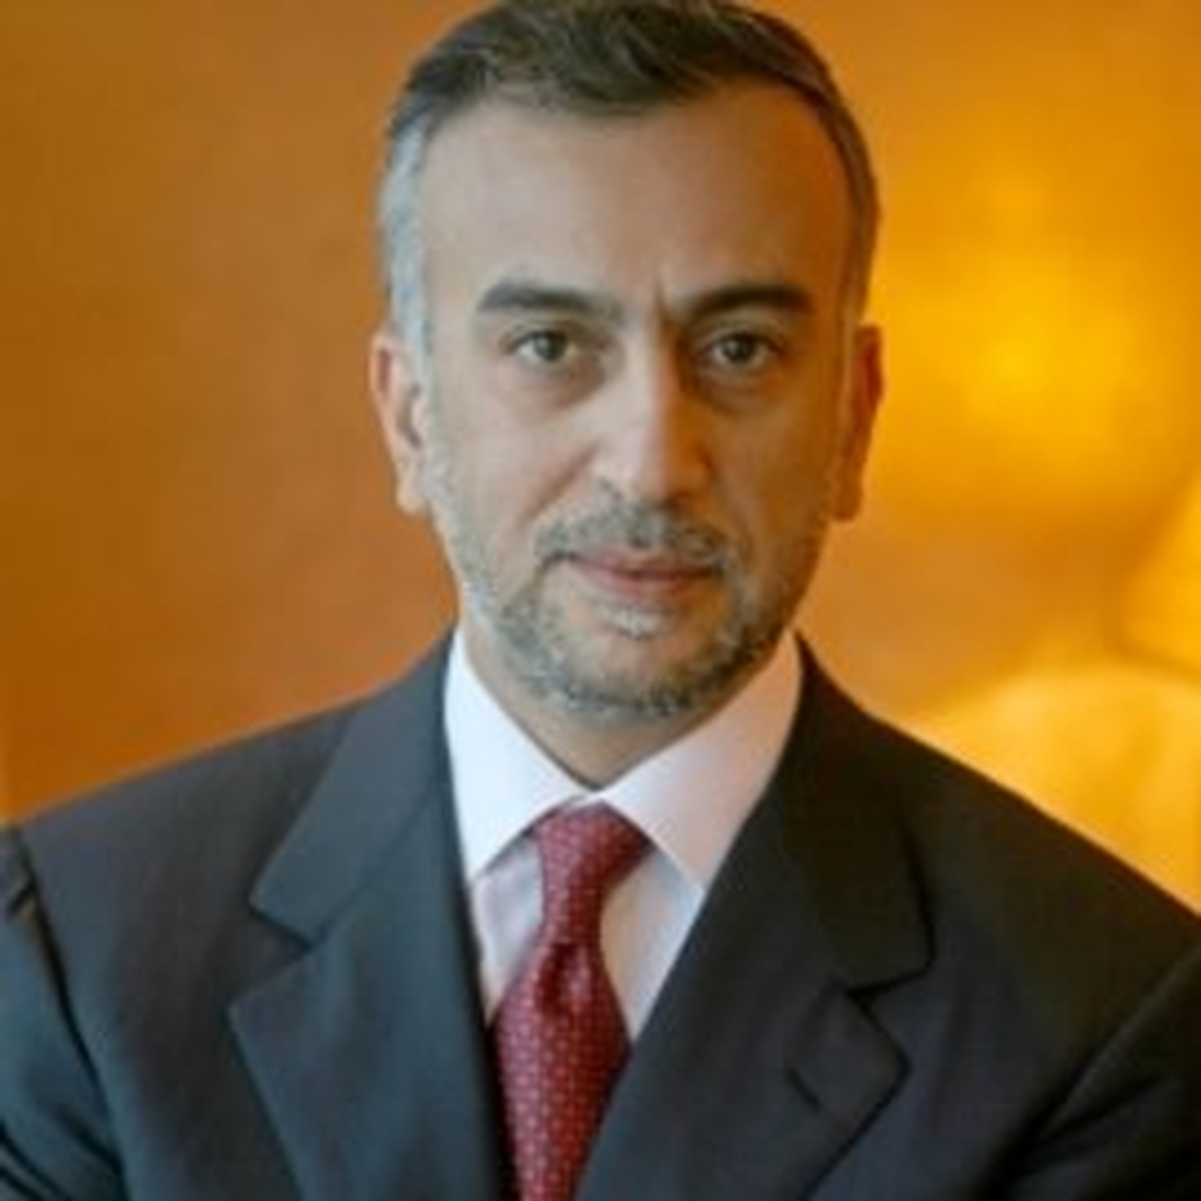 Saeed Al Muntafiq wiki, Saeed Al Muntafiq bio, Saeed Al Muntafiq news